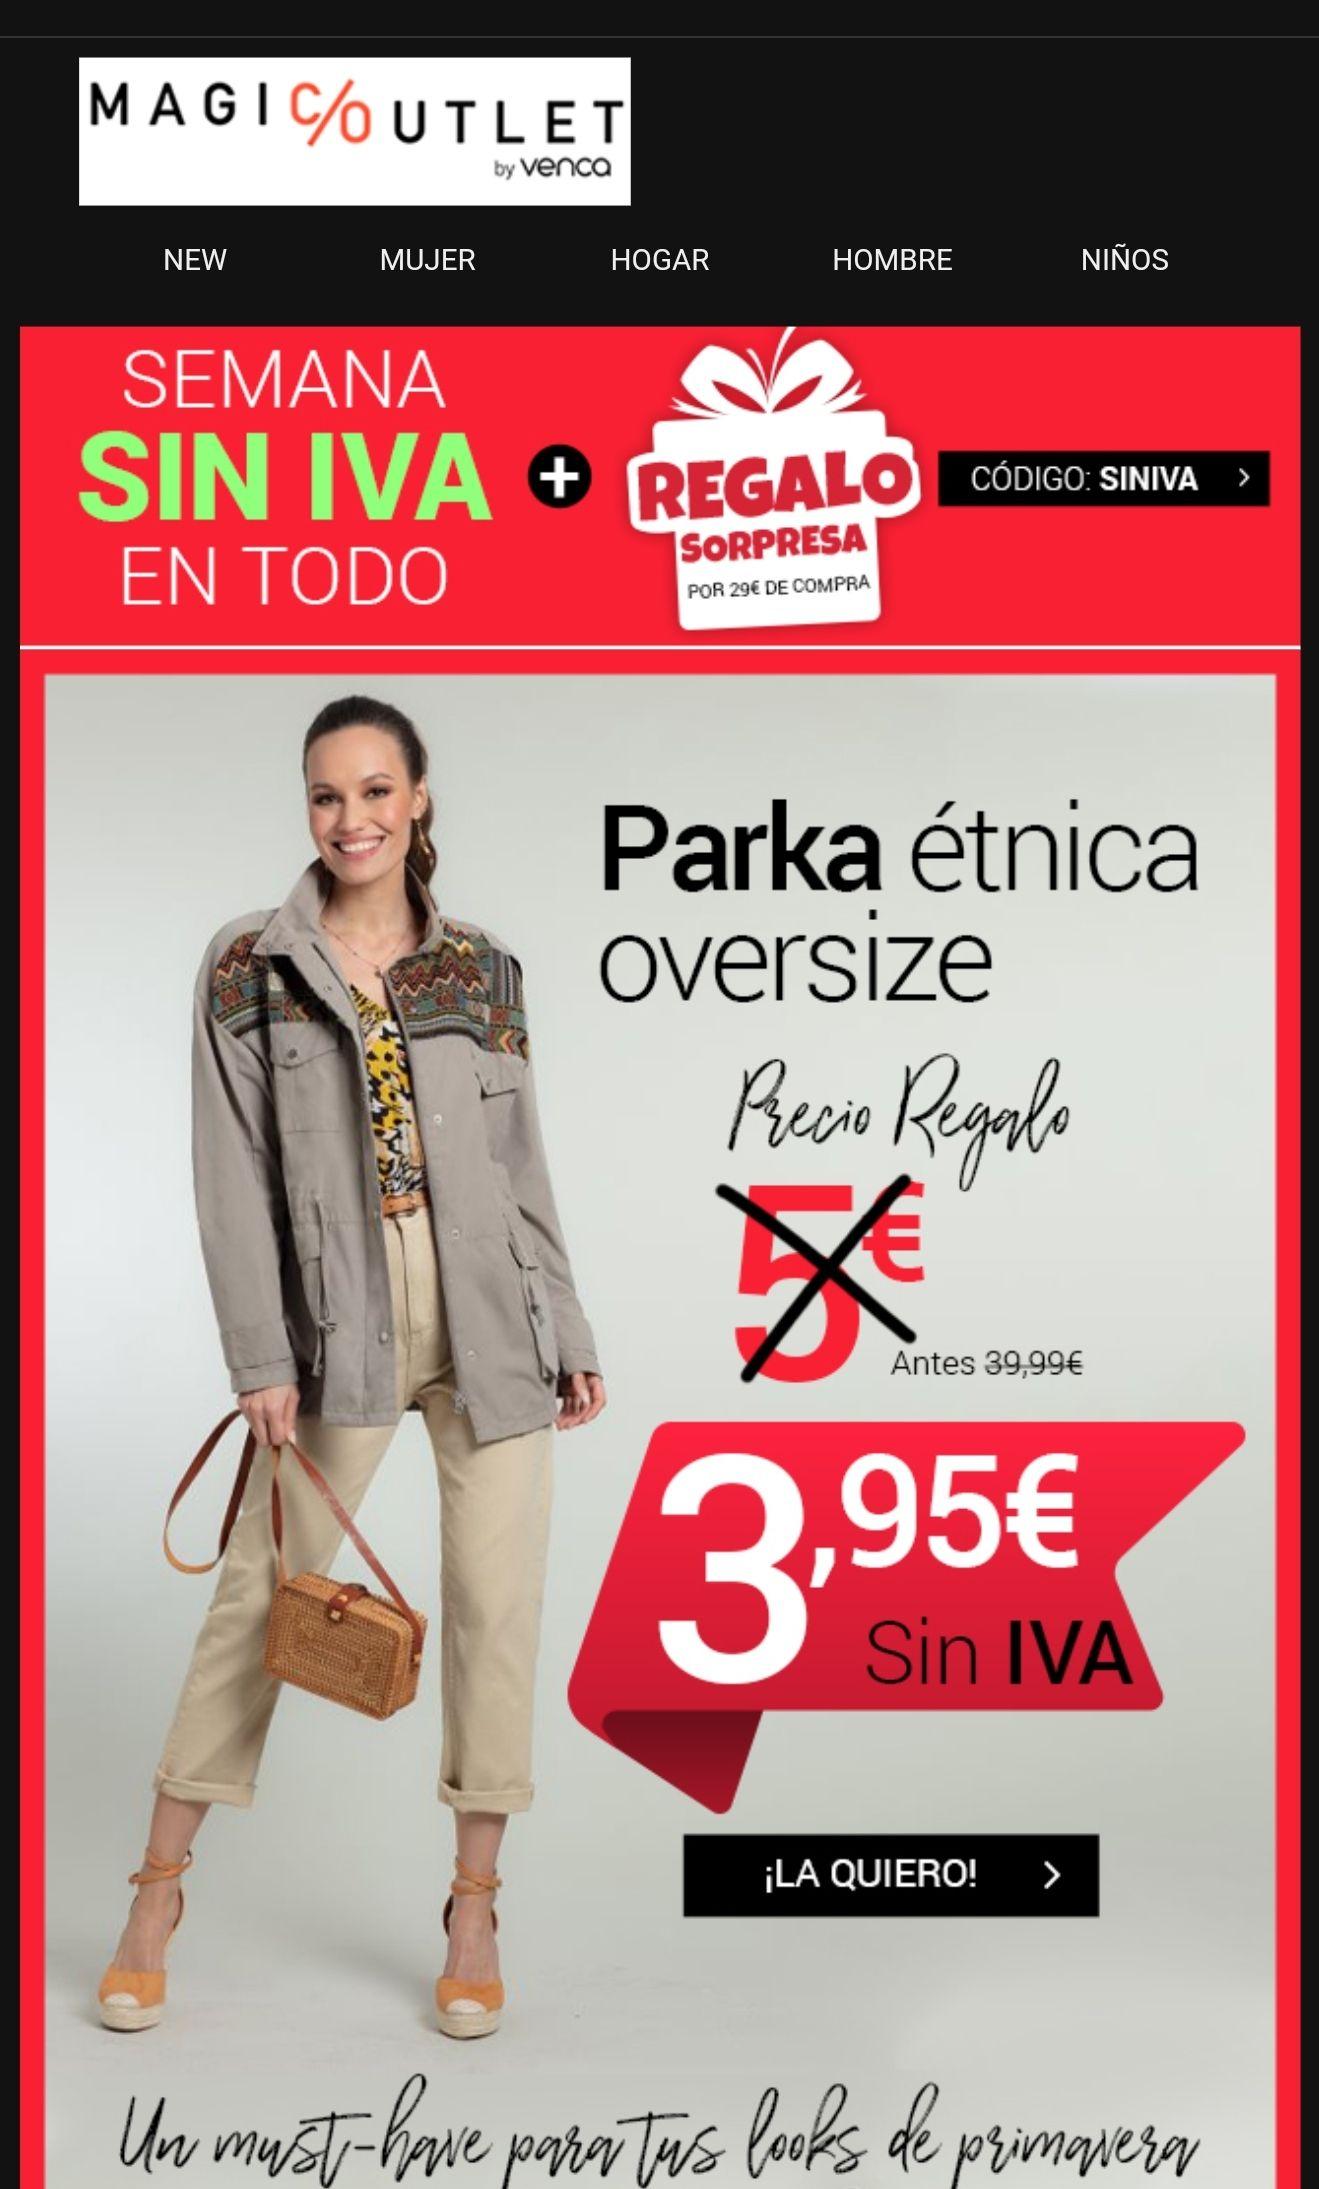 Parka etnica oversize + regalo sorpresa x 29€ de compra